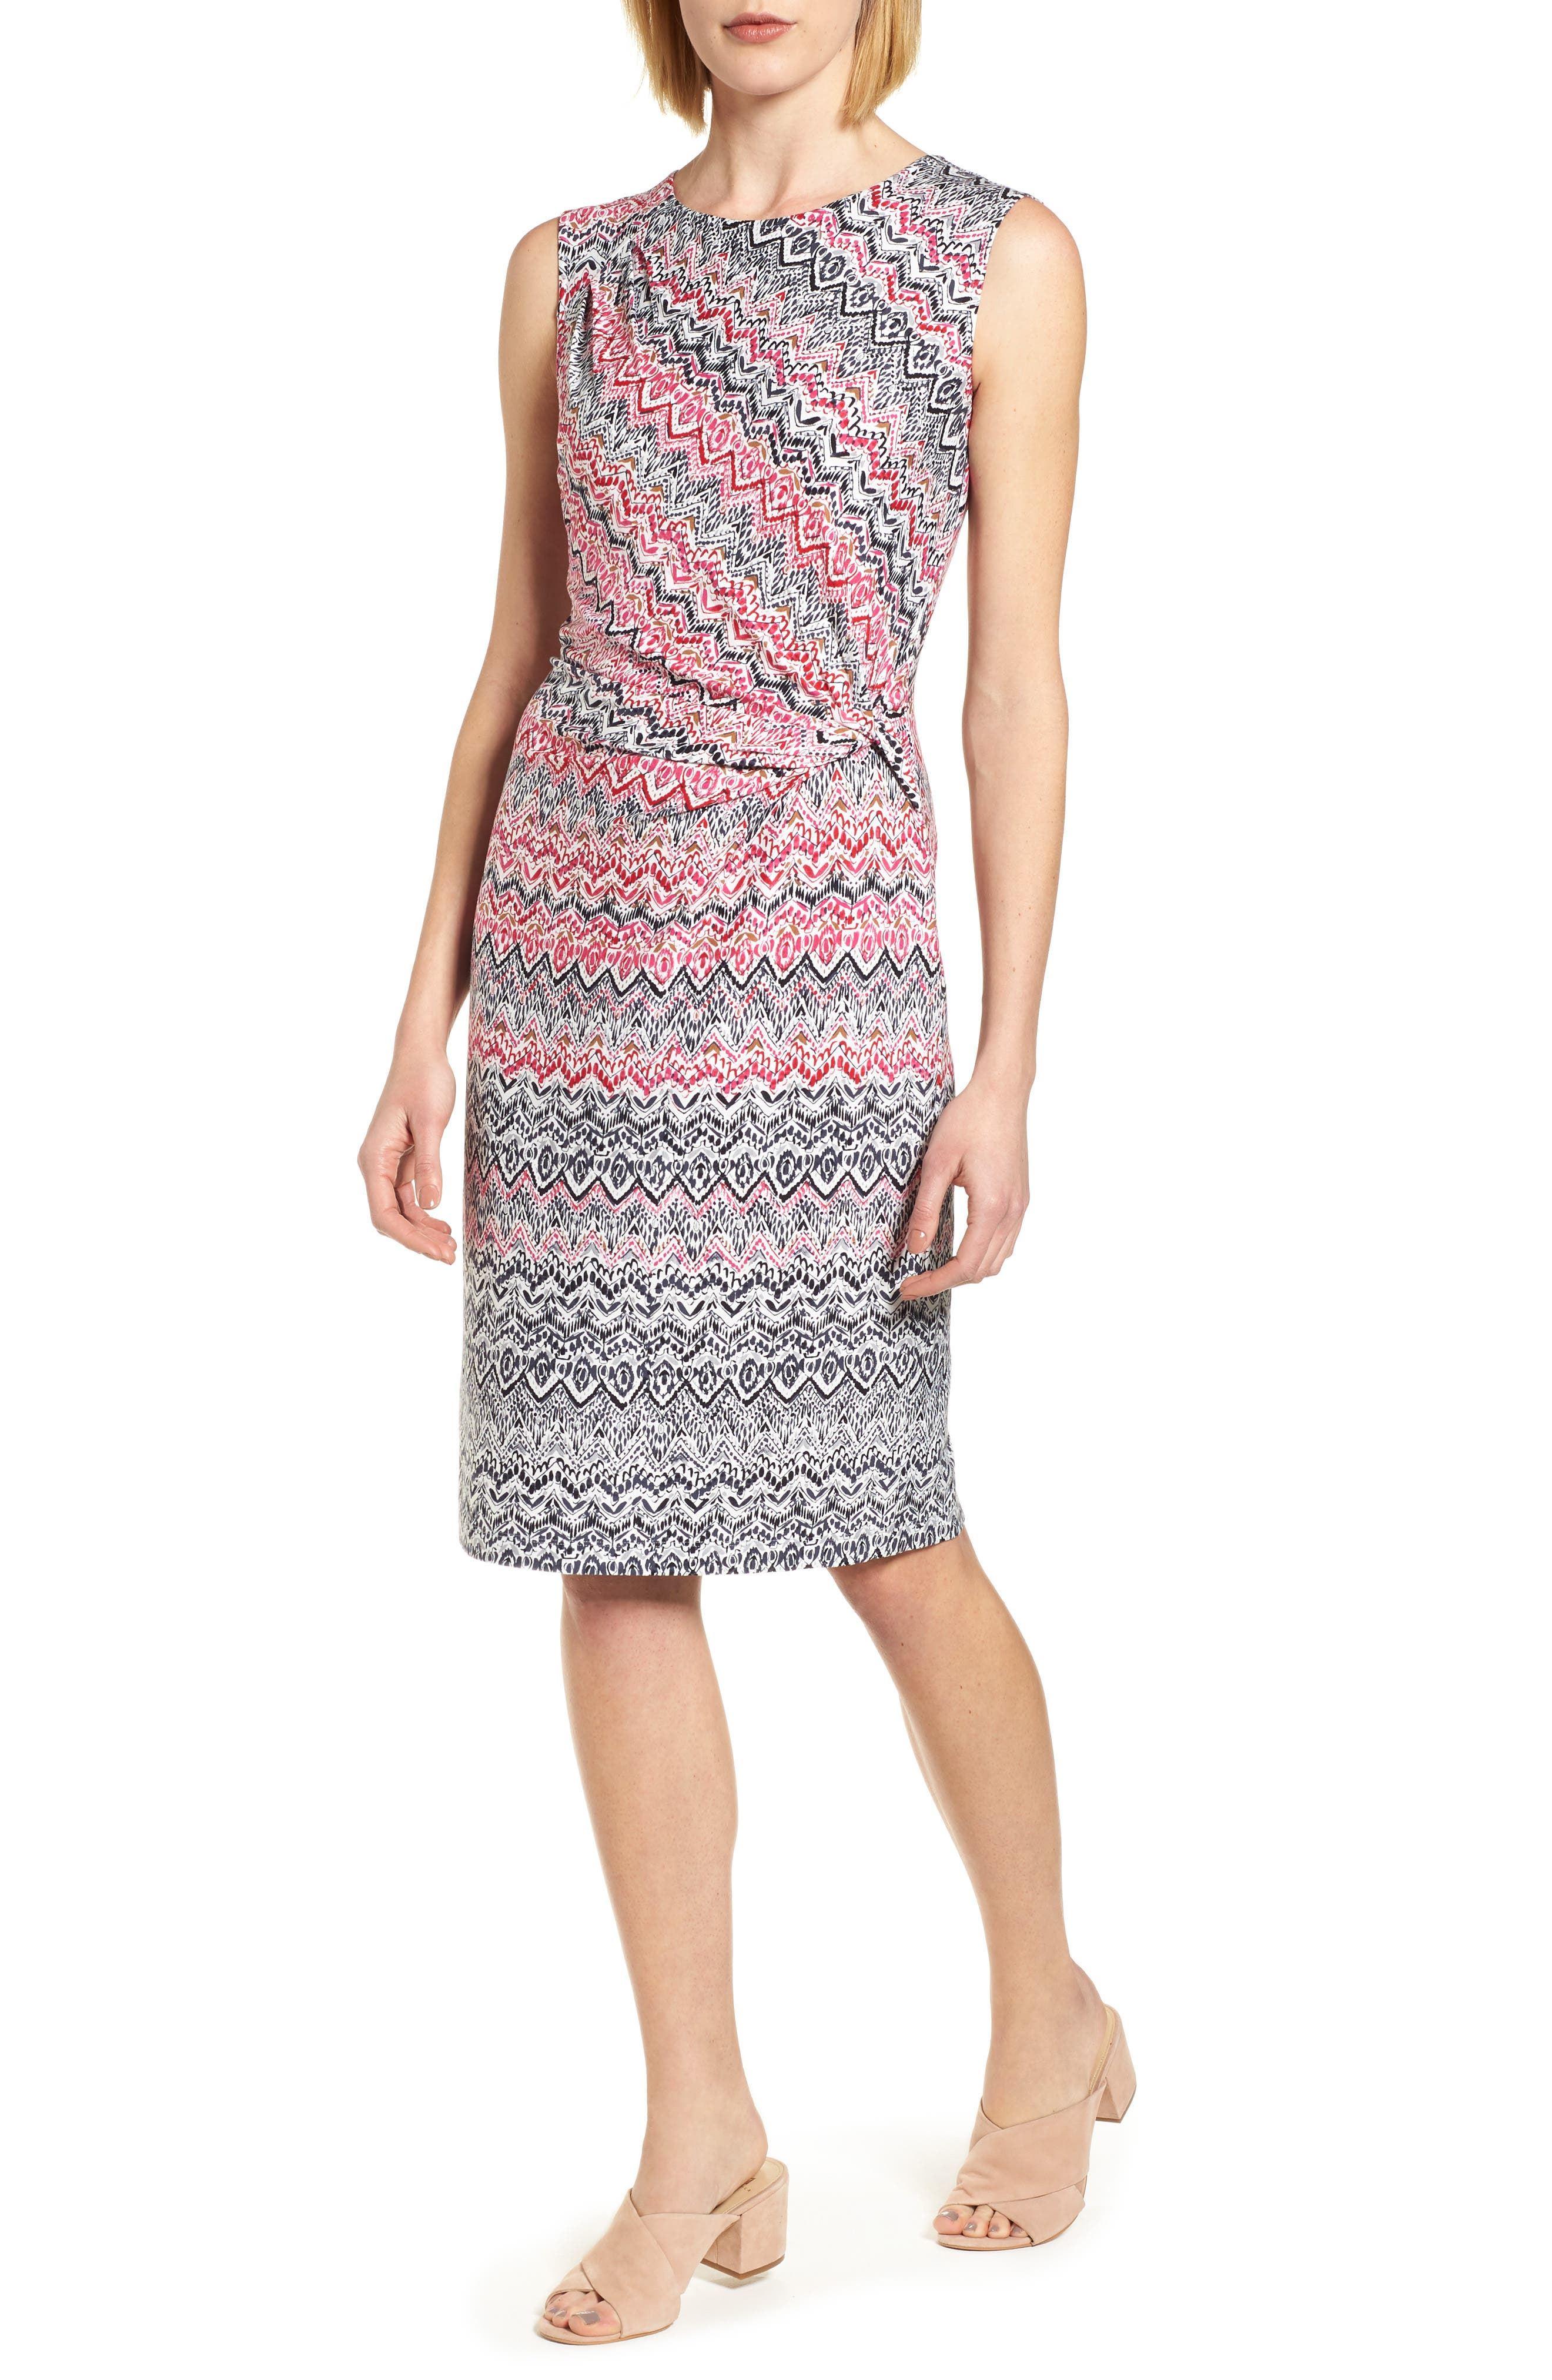 Main Image - NIC+ZOE Spiced Up Twist Sheath Dress (Regular & Petite)